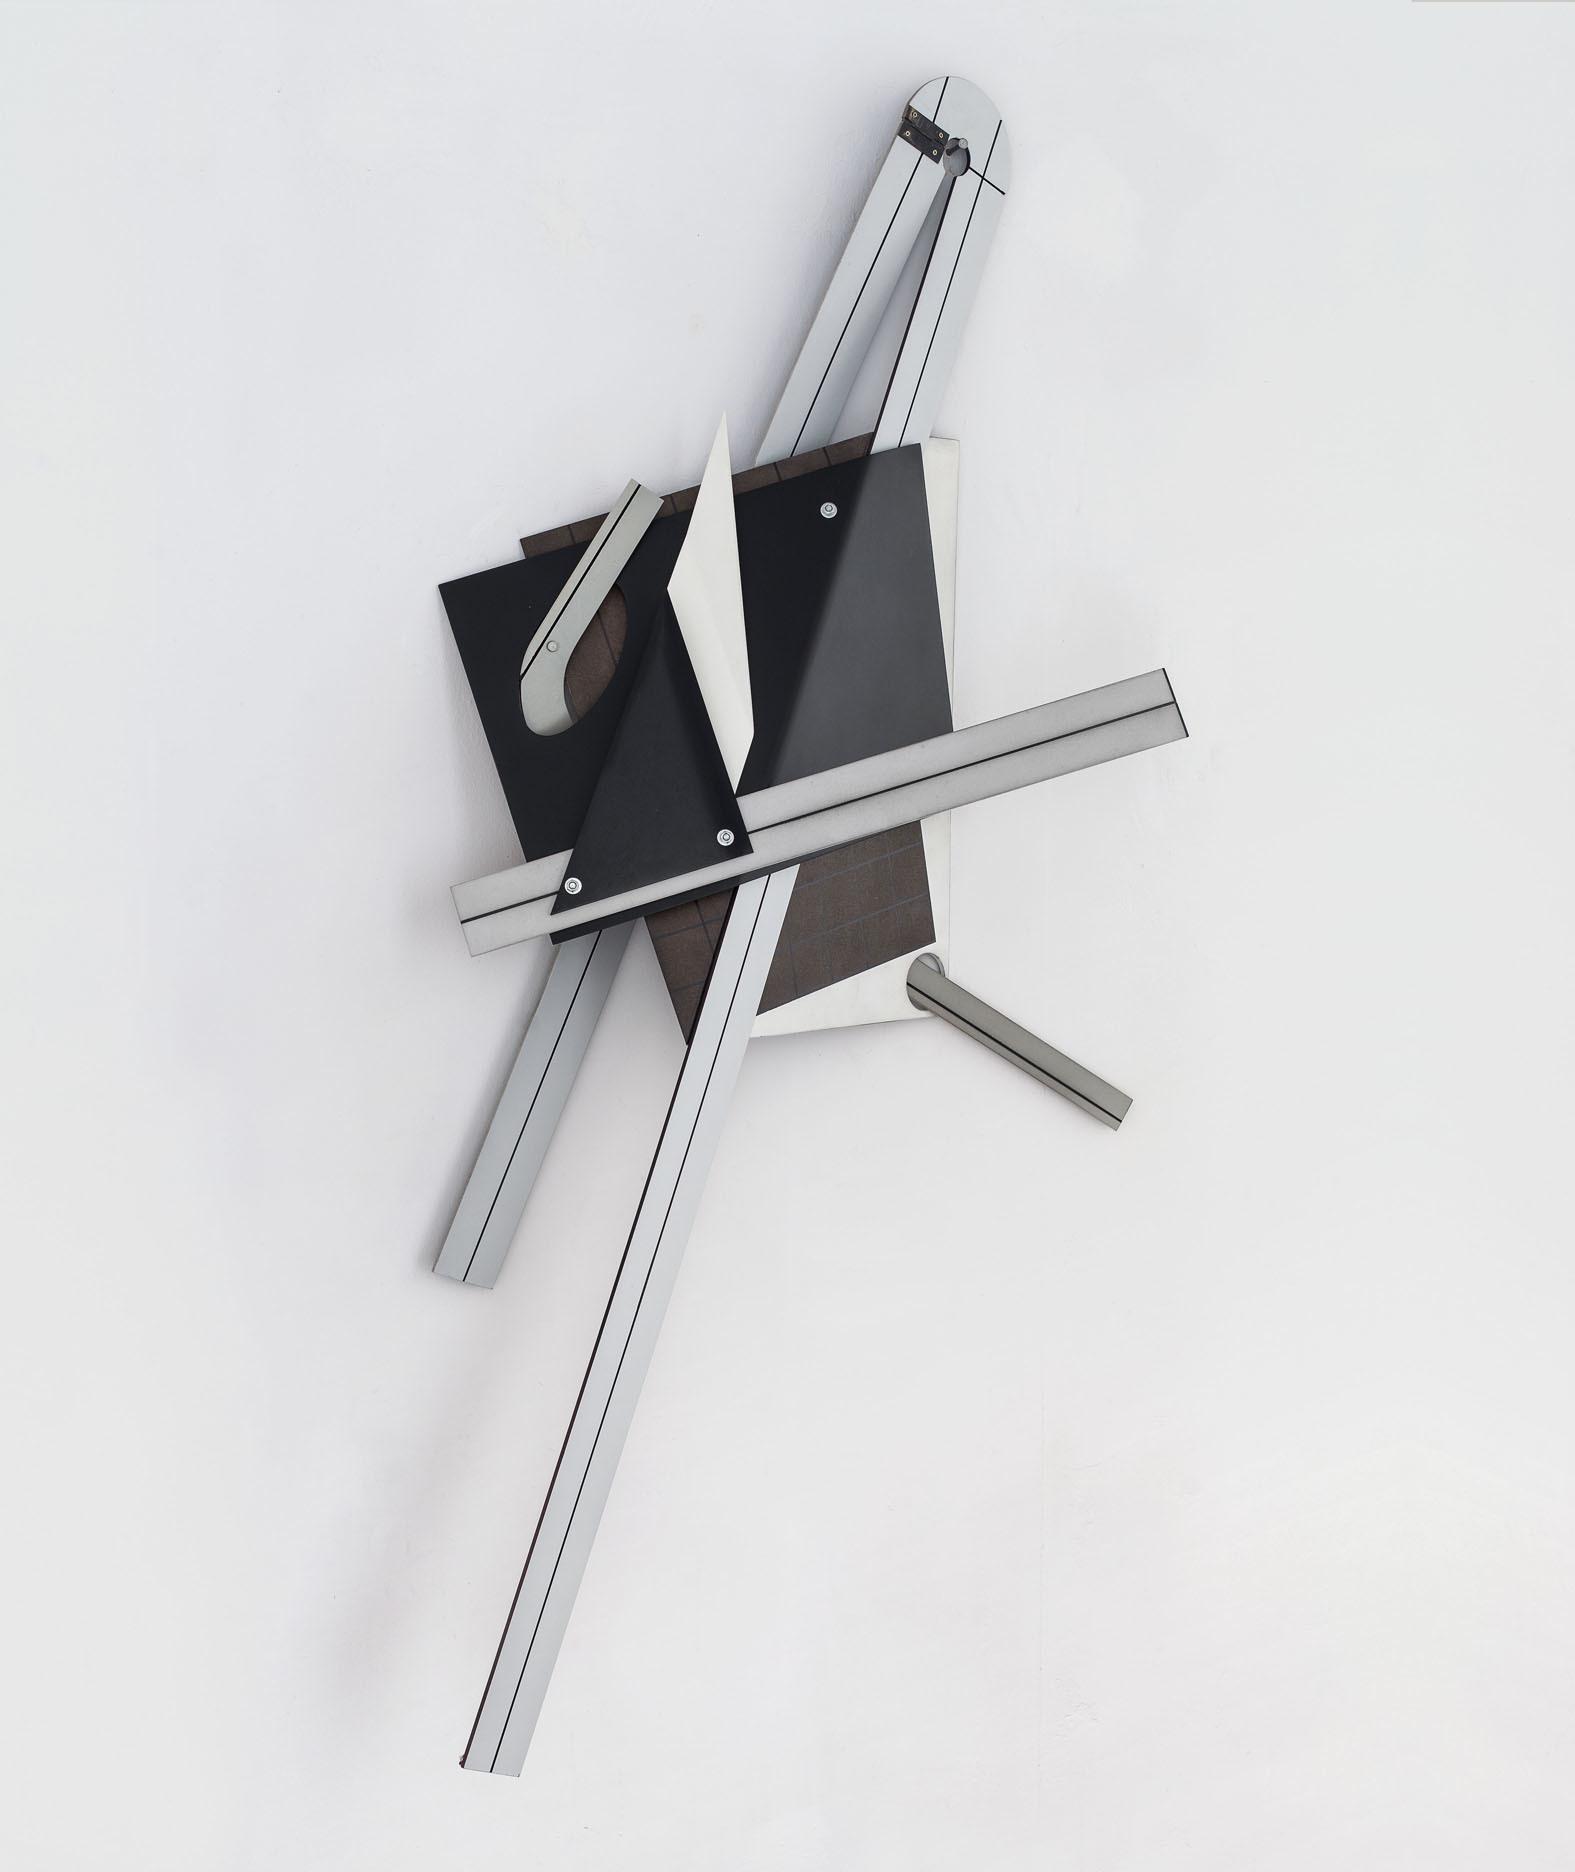 Benjamin Bronni, MT-8/13-13C, 2013, MDF, metal, lakier, ok. 130 x 80 x 20 cm